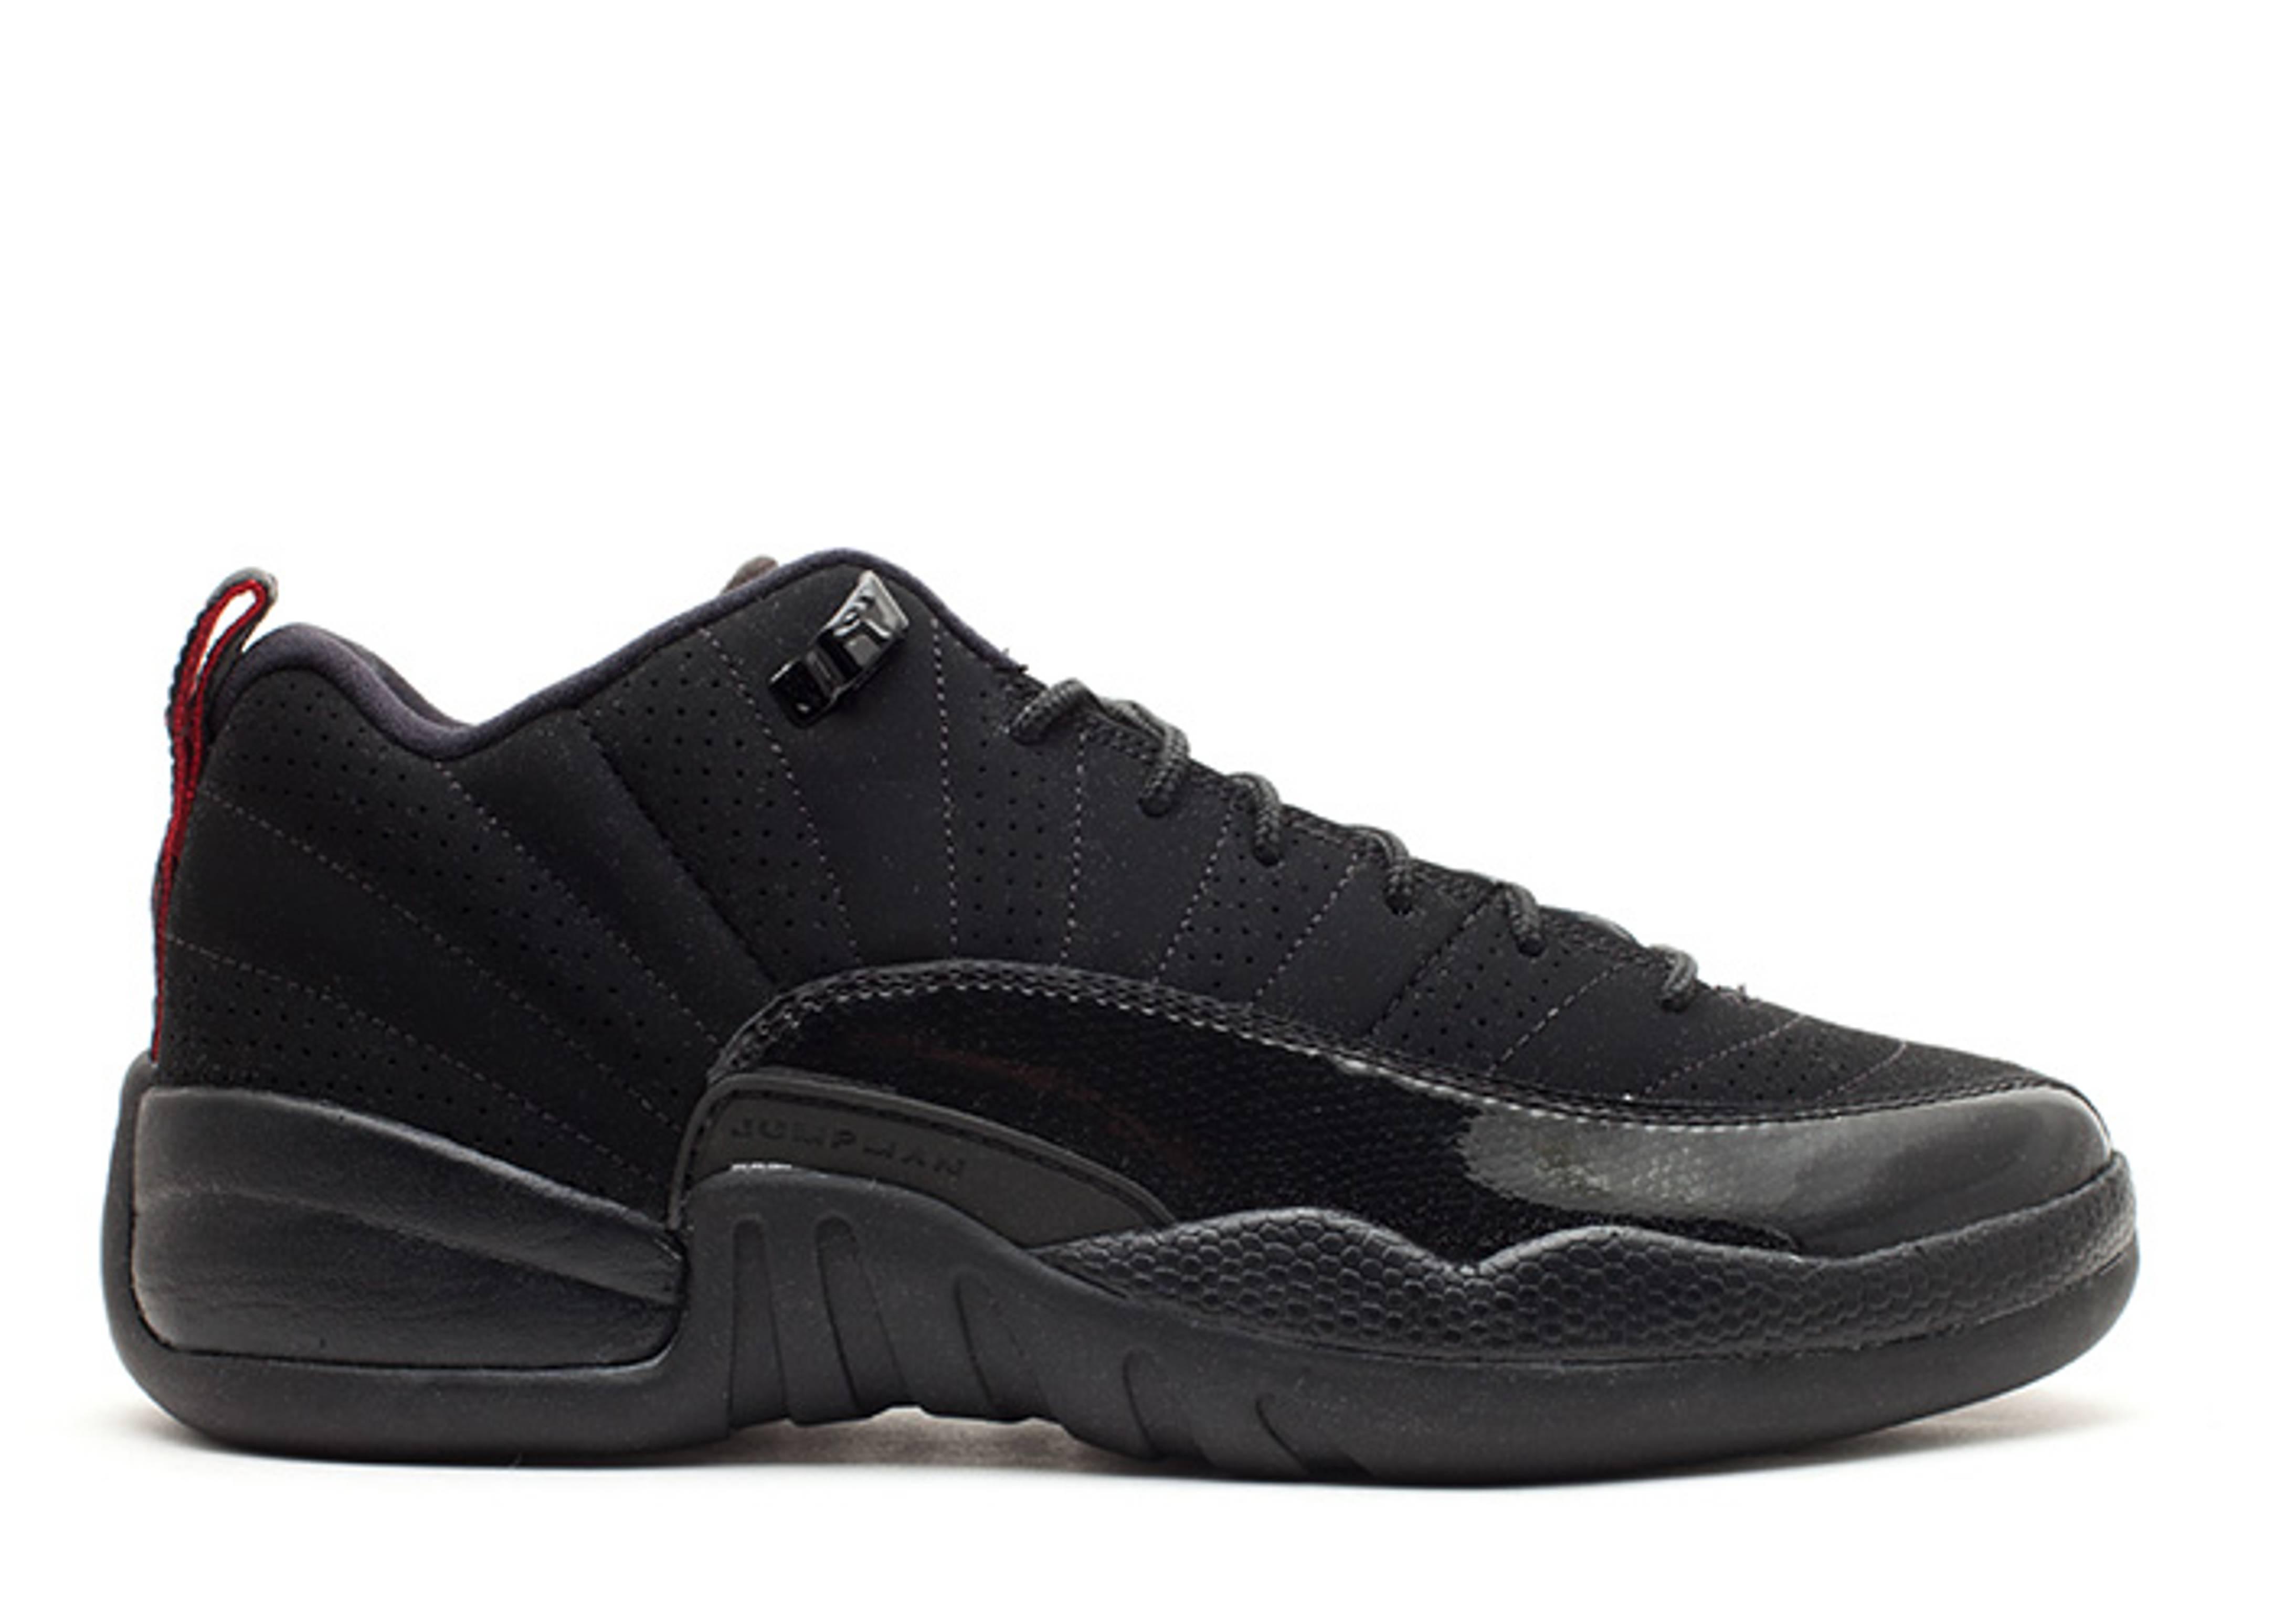 042ed0ecac60 Air Jordans Retro Low Gs Black white Air Jordans Retro Low Top ...